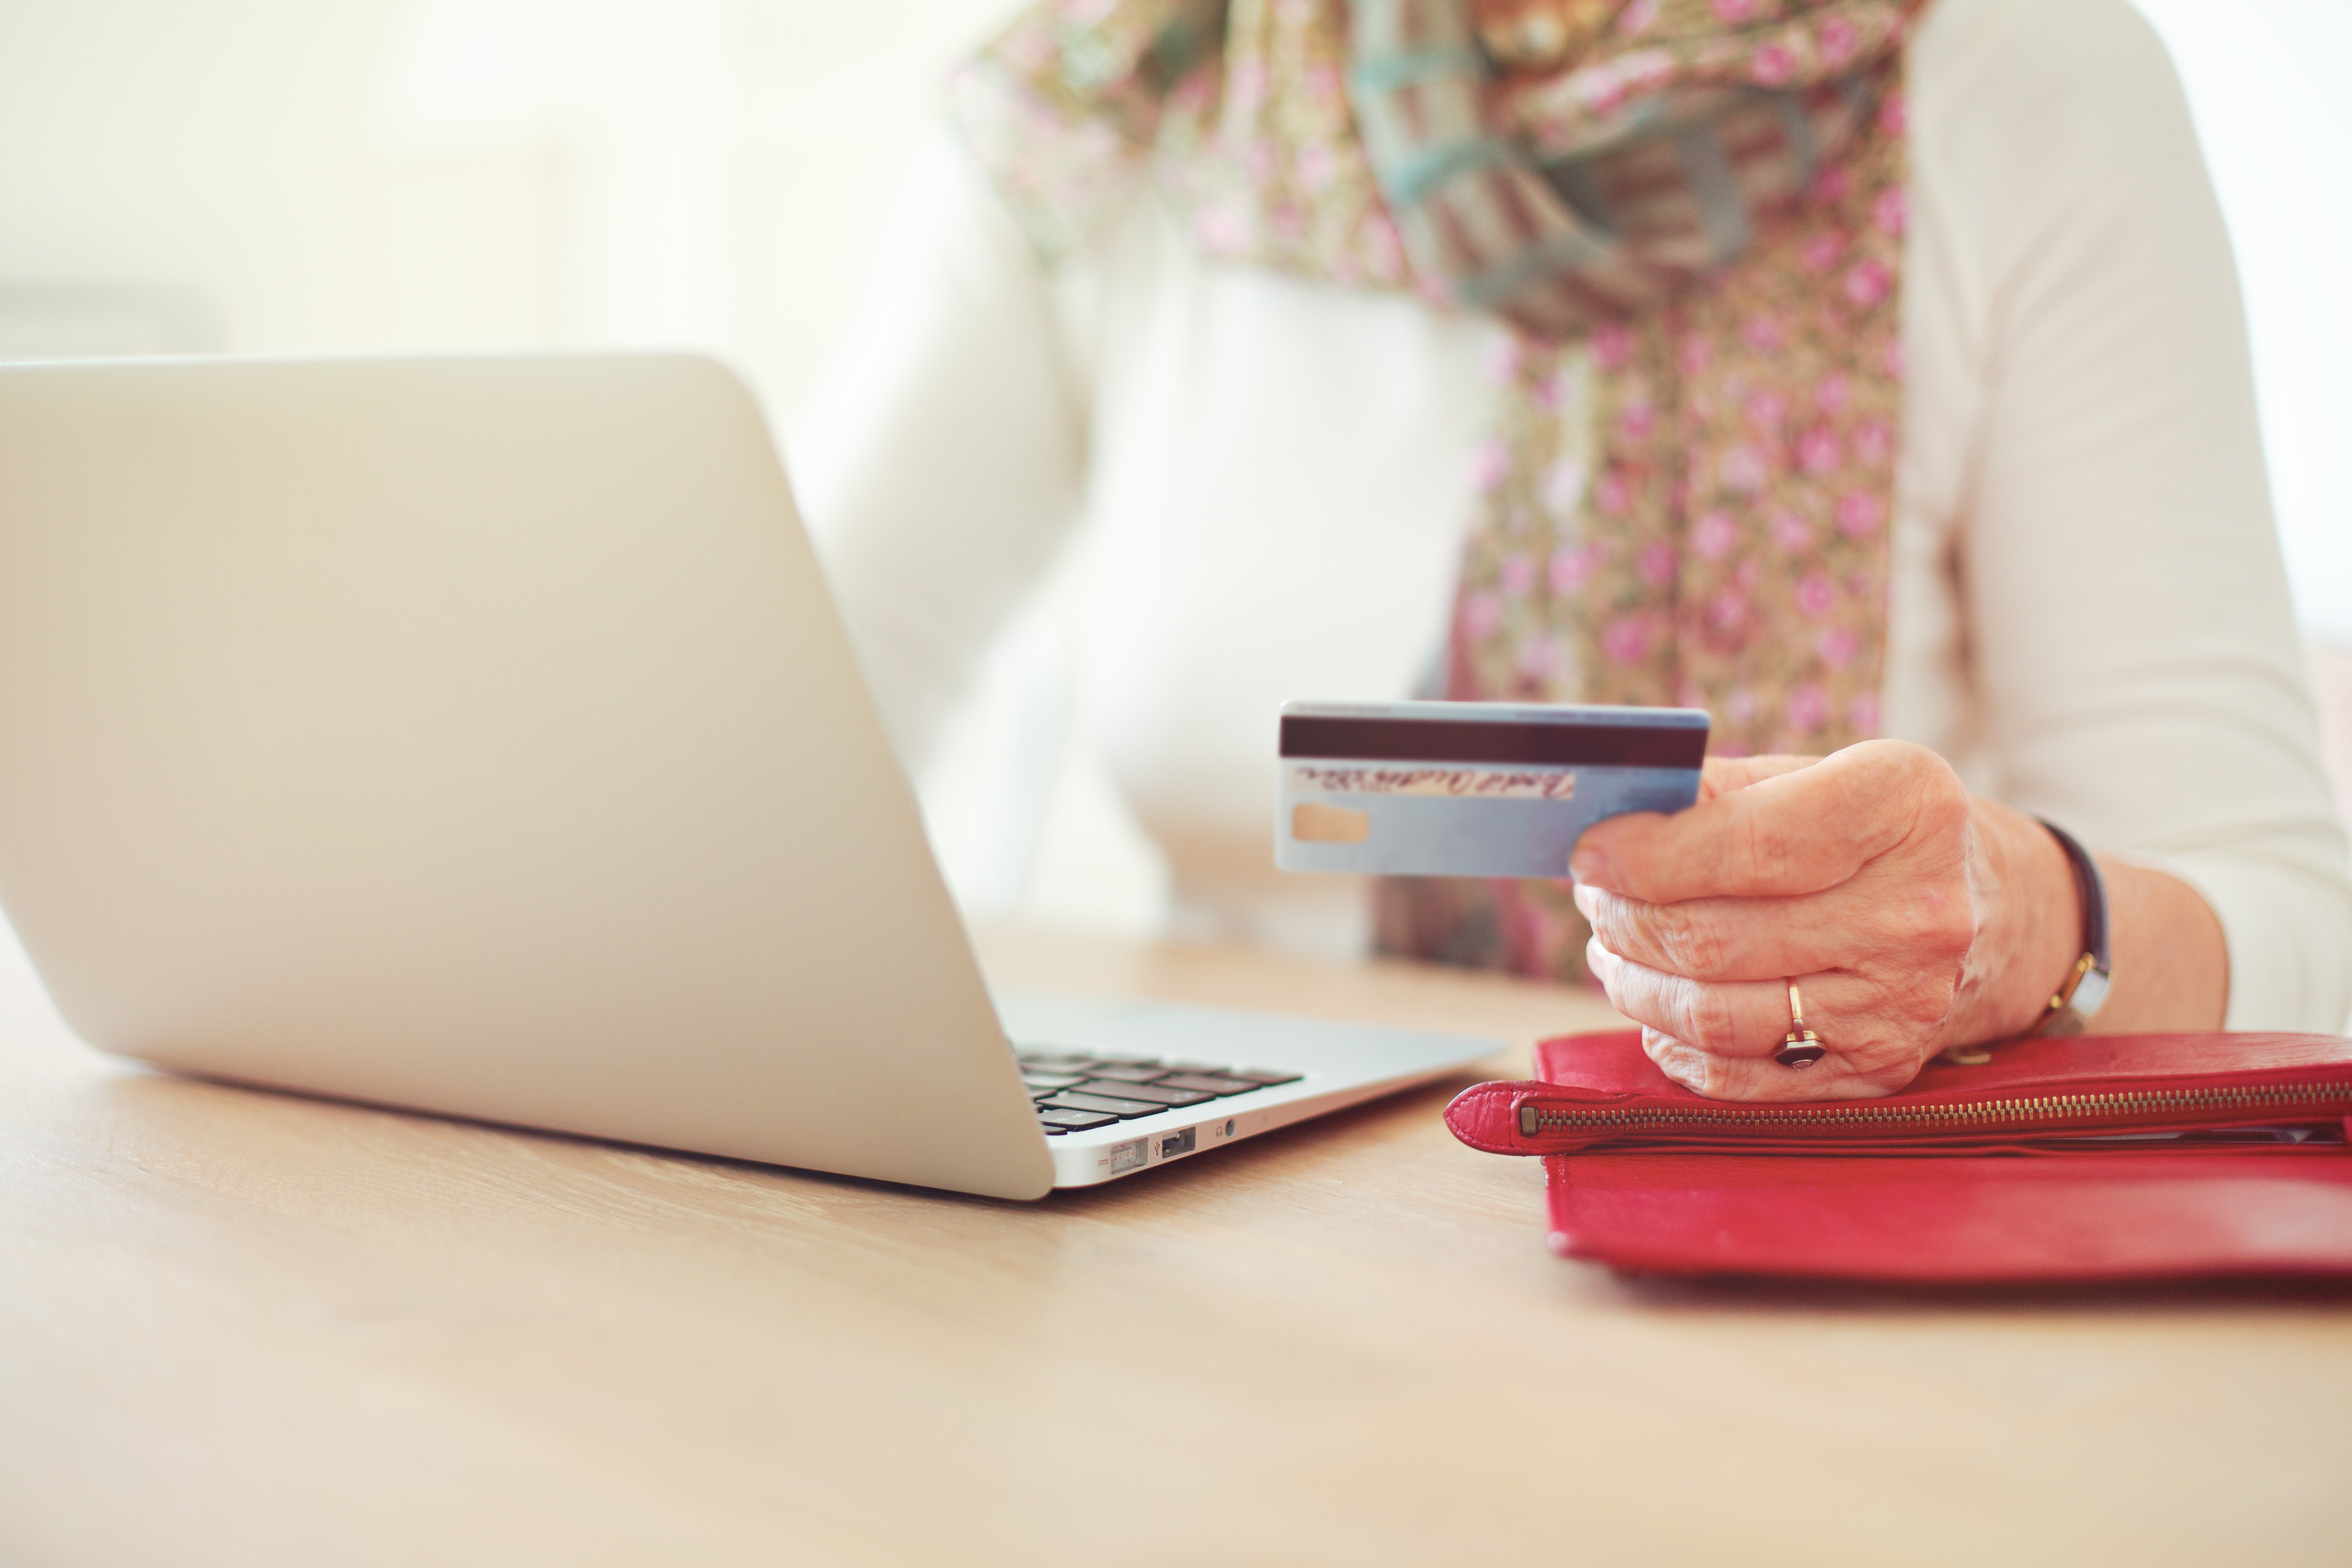 Credit Card Eftpos Fraud Qps